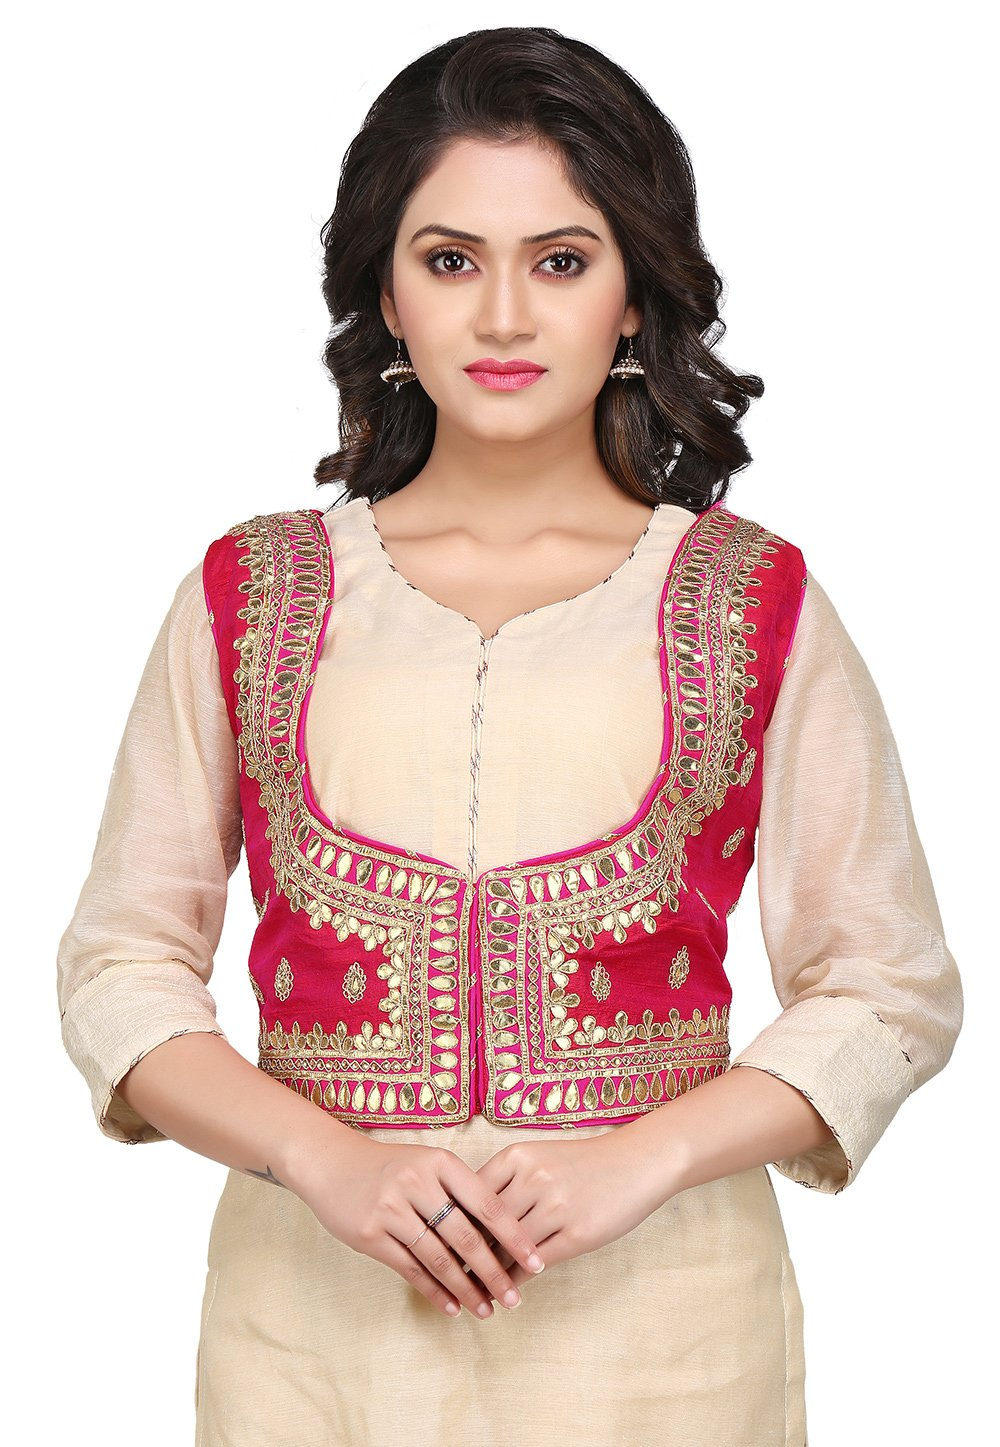 Utsav Fashion Gota Patti Dupion Silk Jacket in Fuchsia by Utsav Fashion